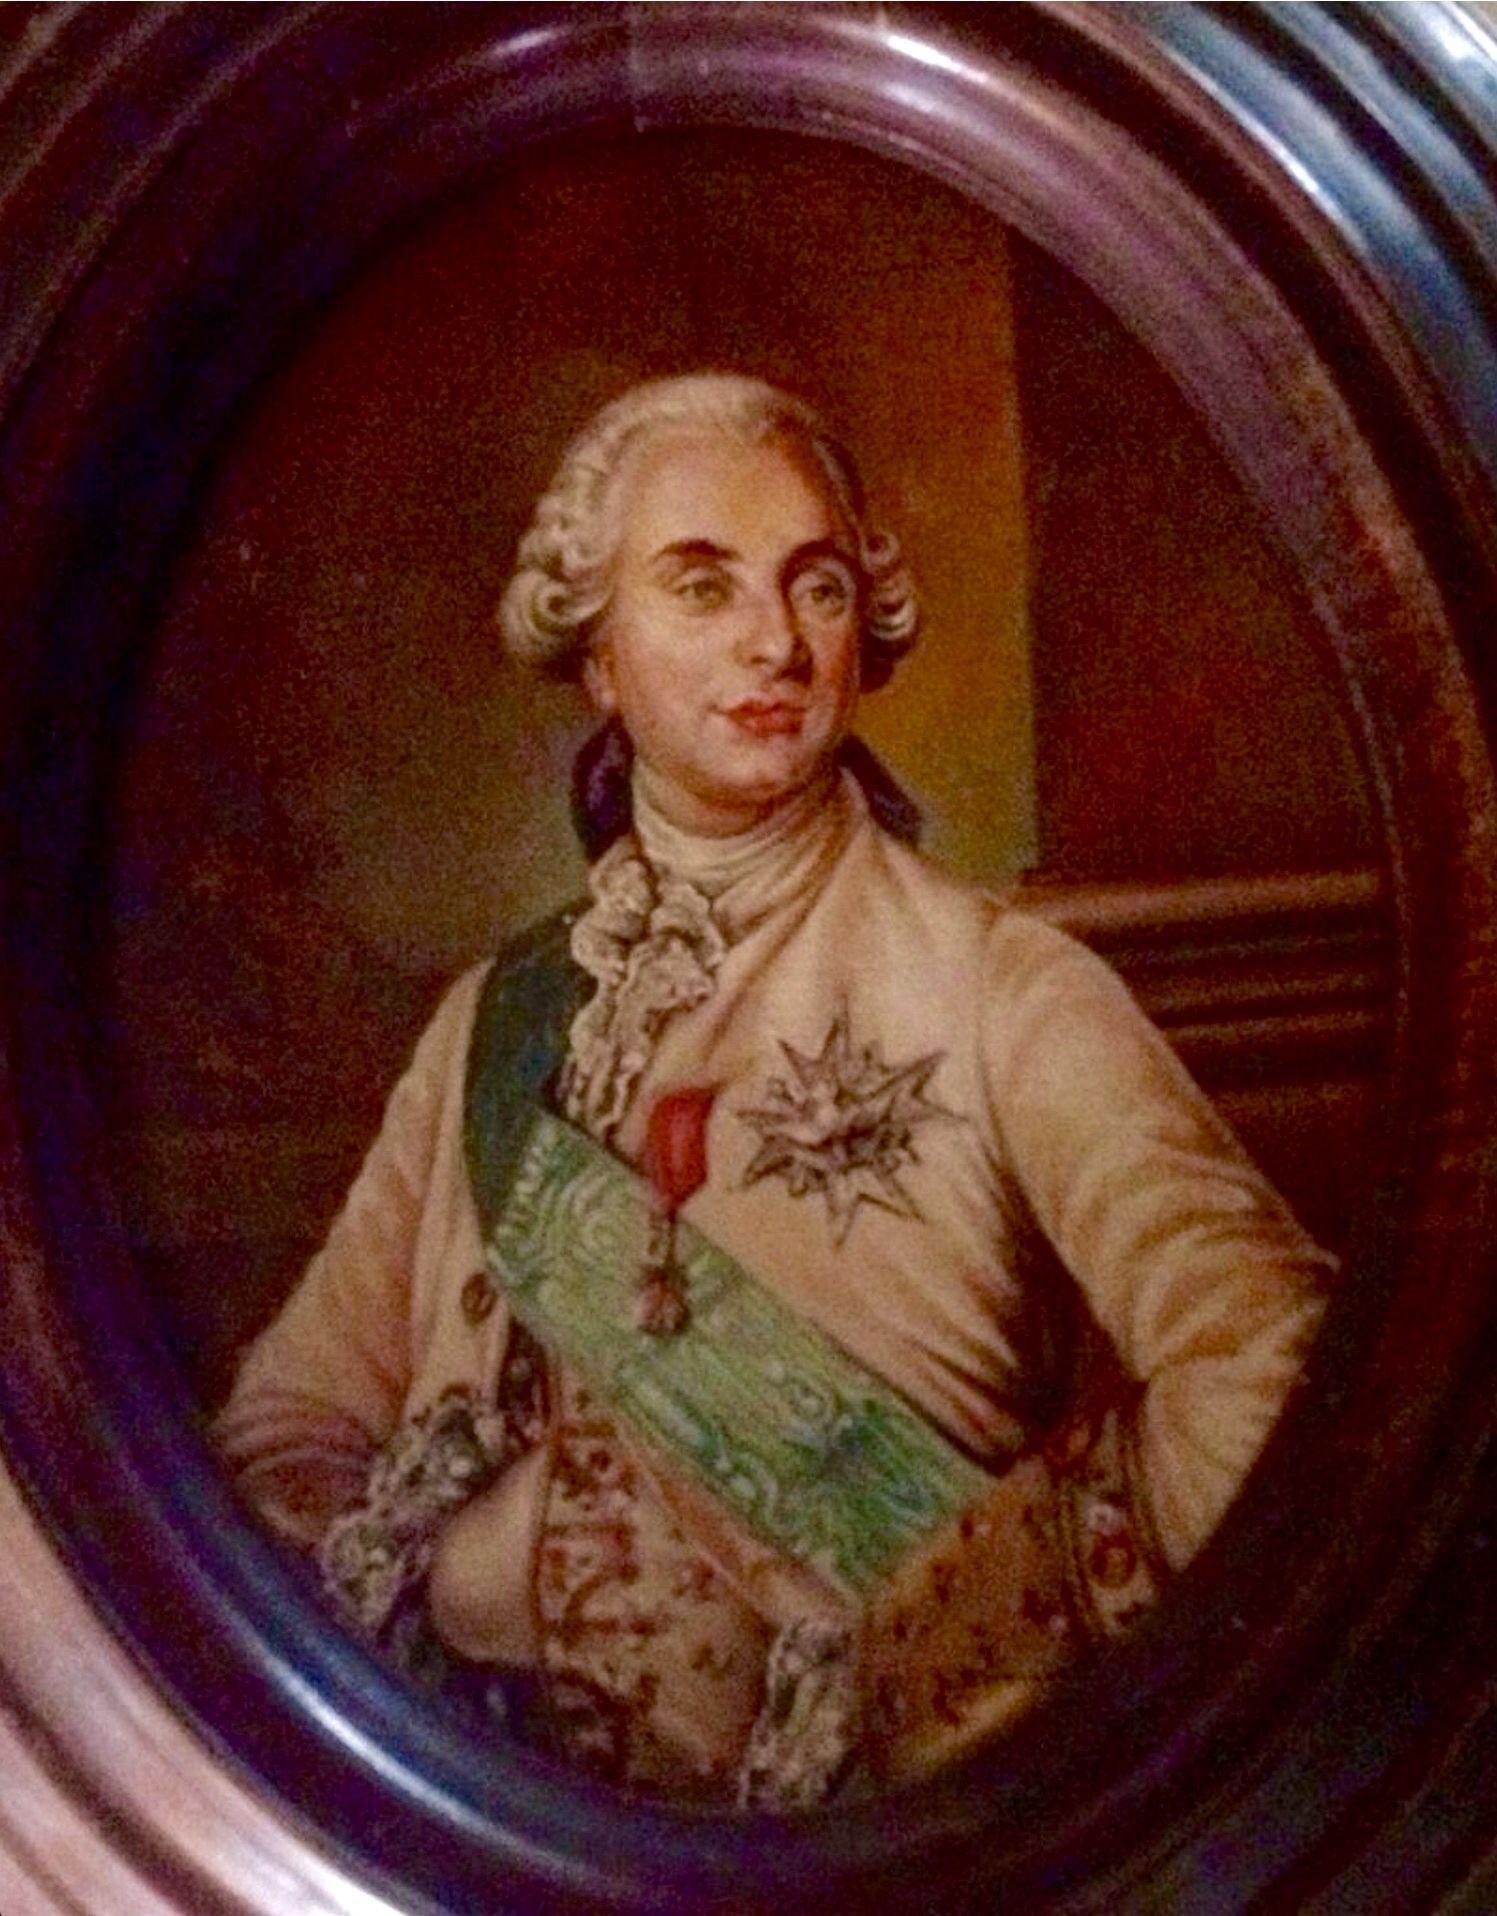 Miniatura de Luis XVI por Luis Zermeño Rico en Oleo